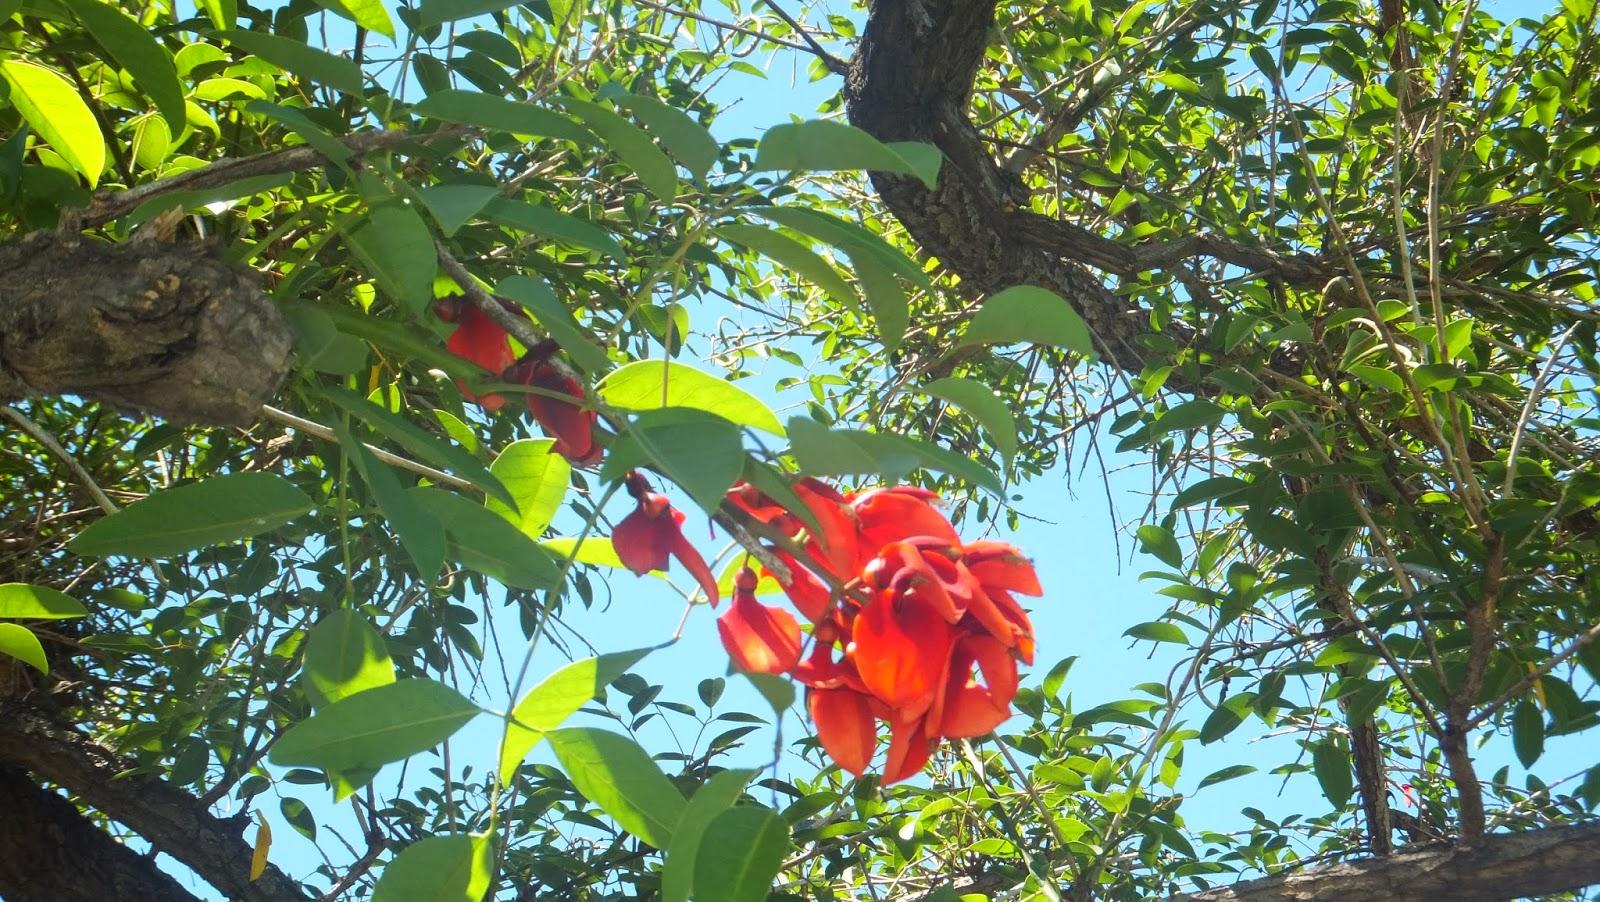 Flor de Ceibo, Rosario, Argentina, Elisa N, Blog de Viajes, Lifestyle, Travel